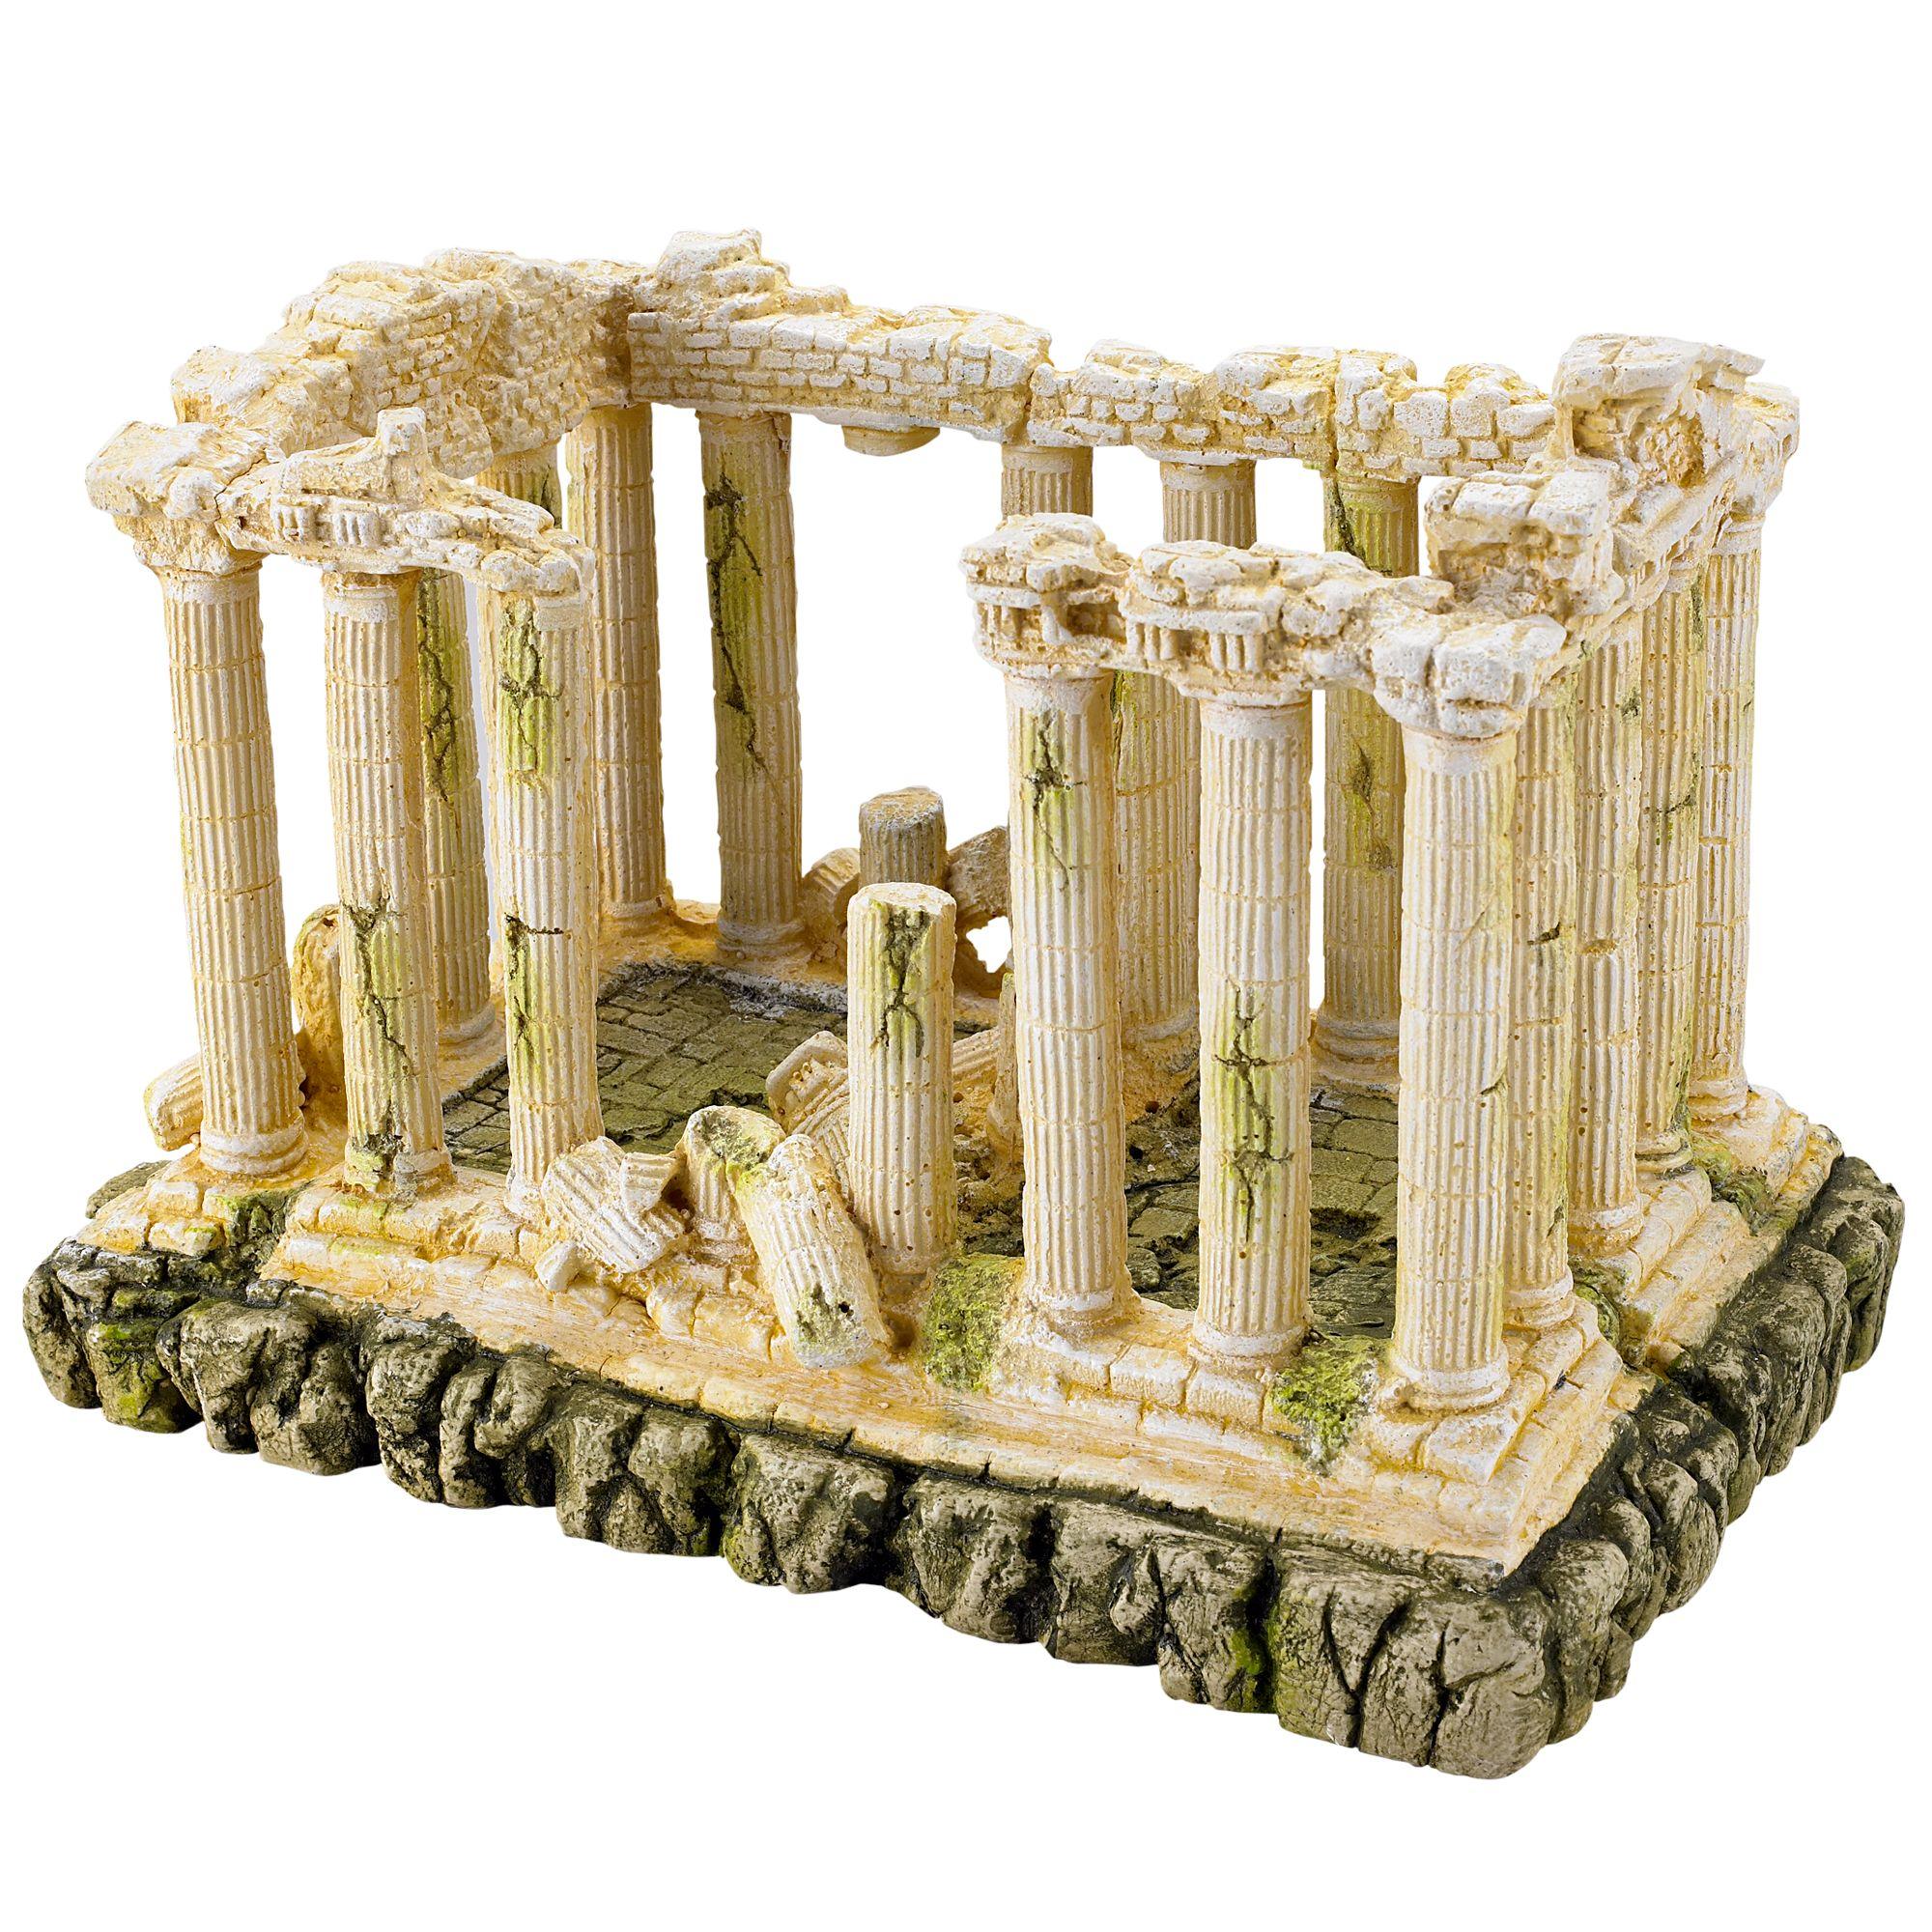 Pet Supplies Decorations Ancient Roman Ruins Ornament For Aquarium Fish Tank Decoration Terrarium Decor Younglordholding Ir